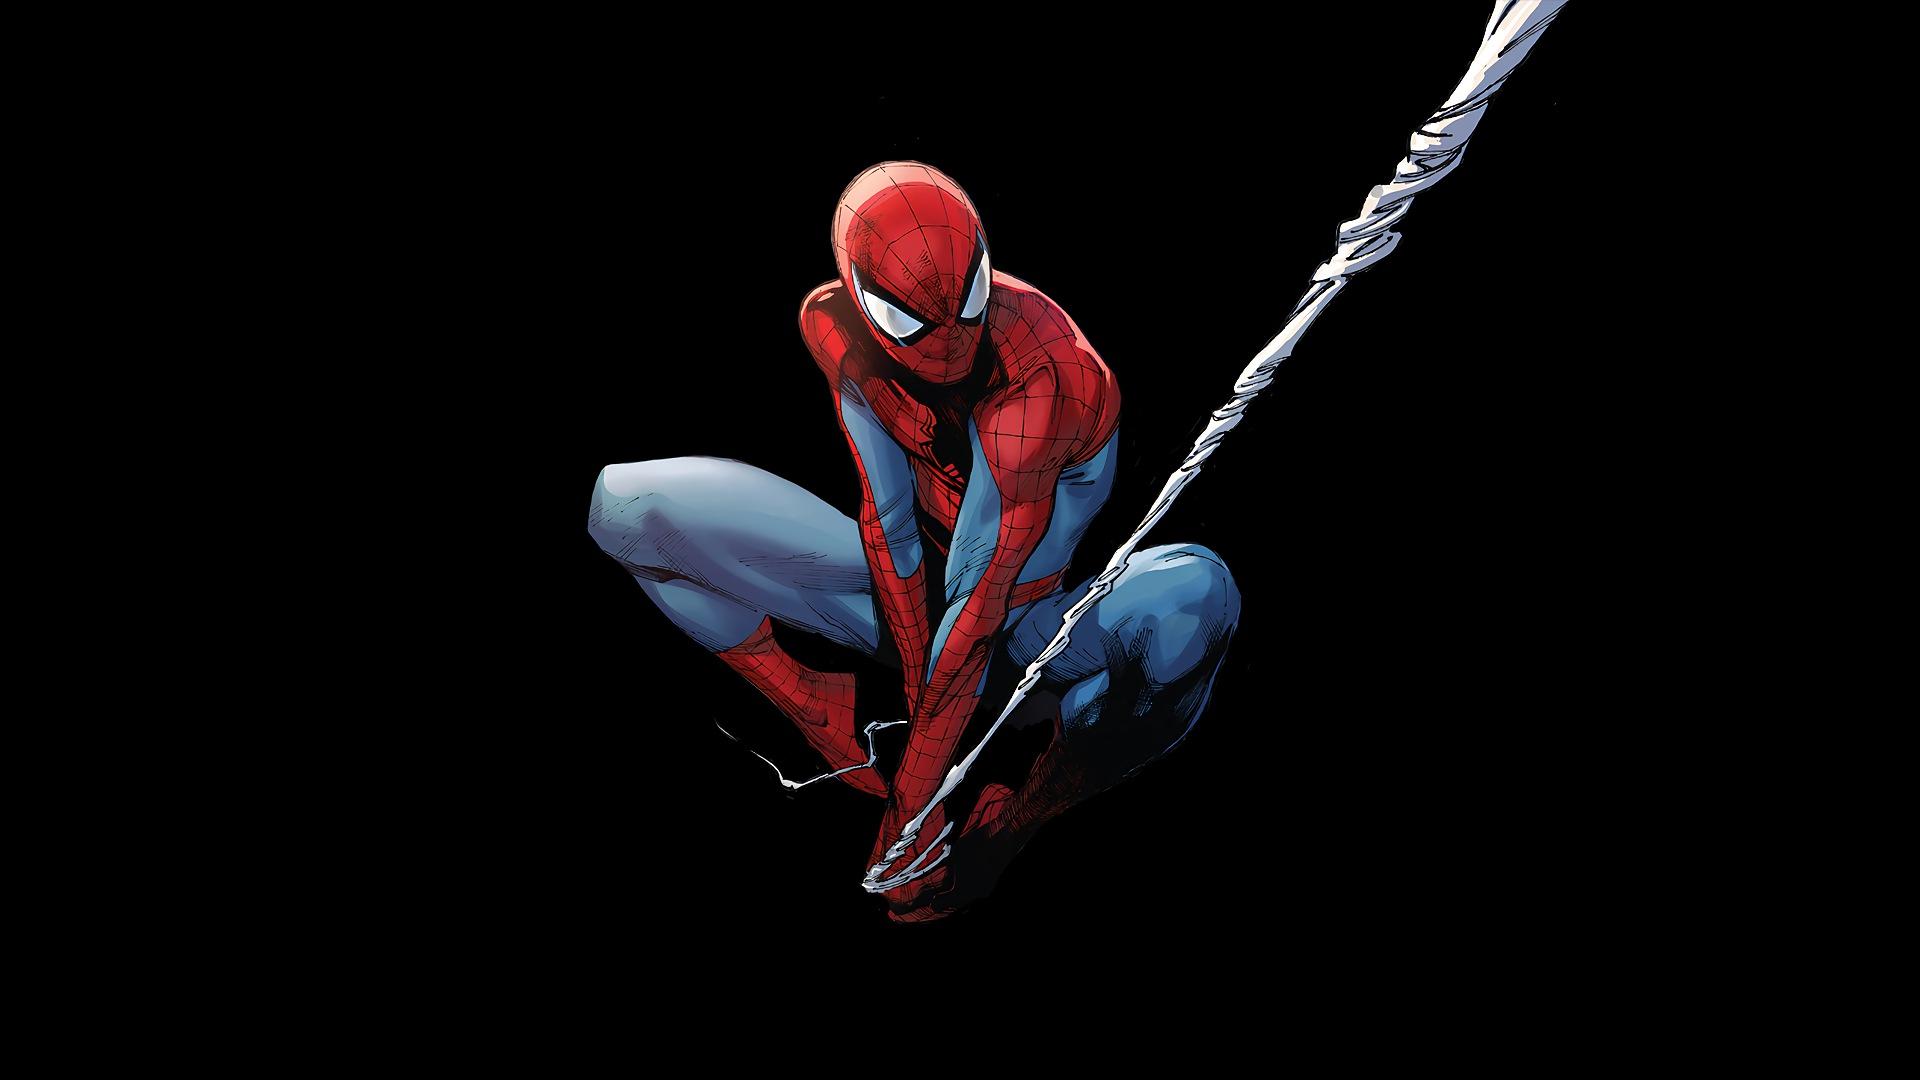 General 1920x1080 Marvel Comics Spider-Man black background superhero